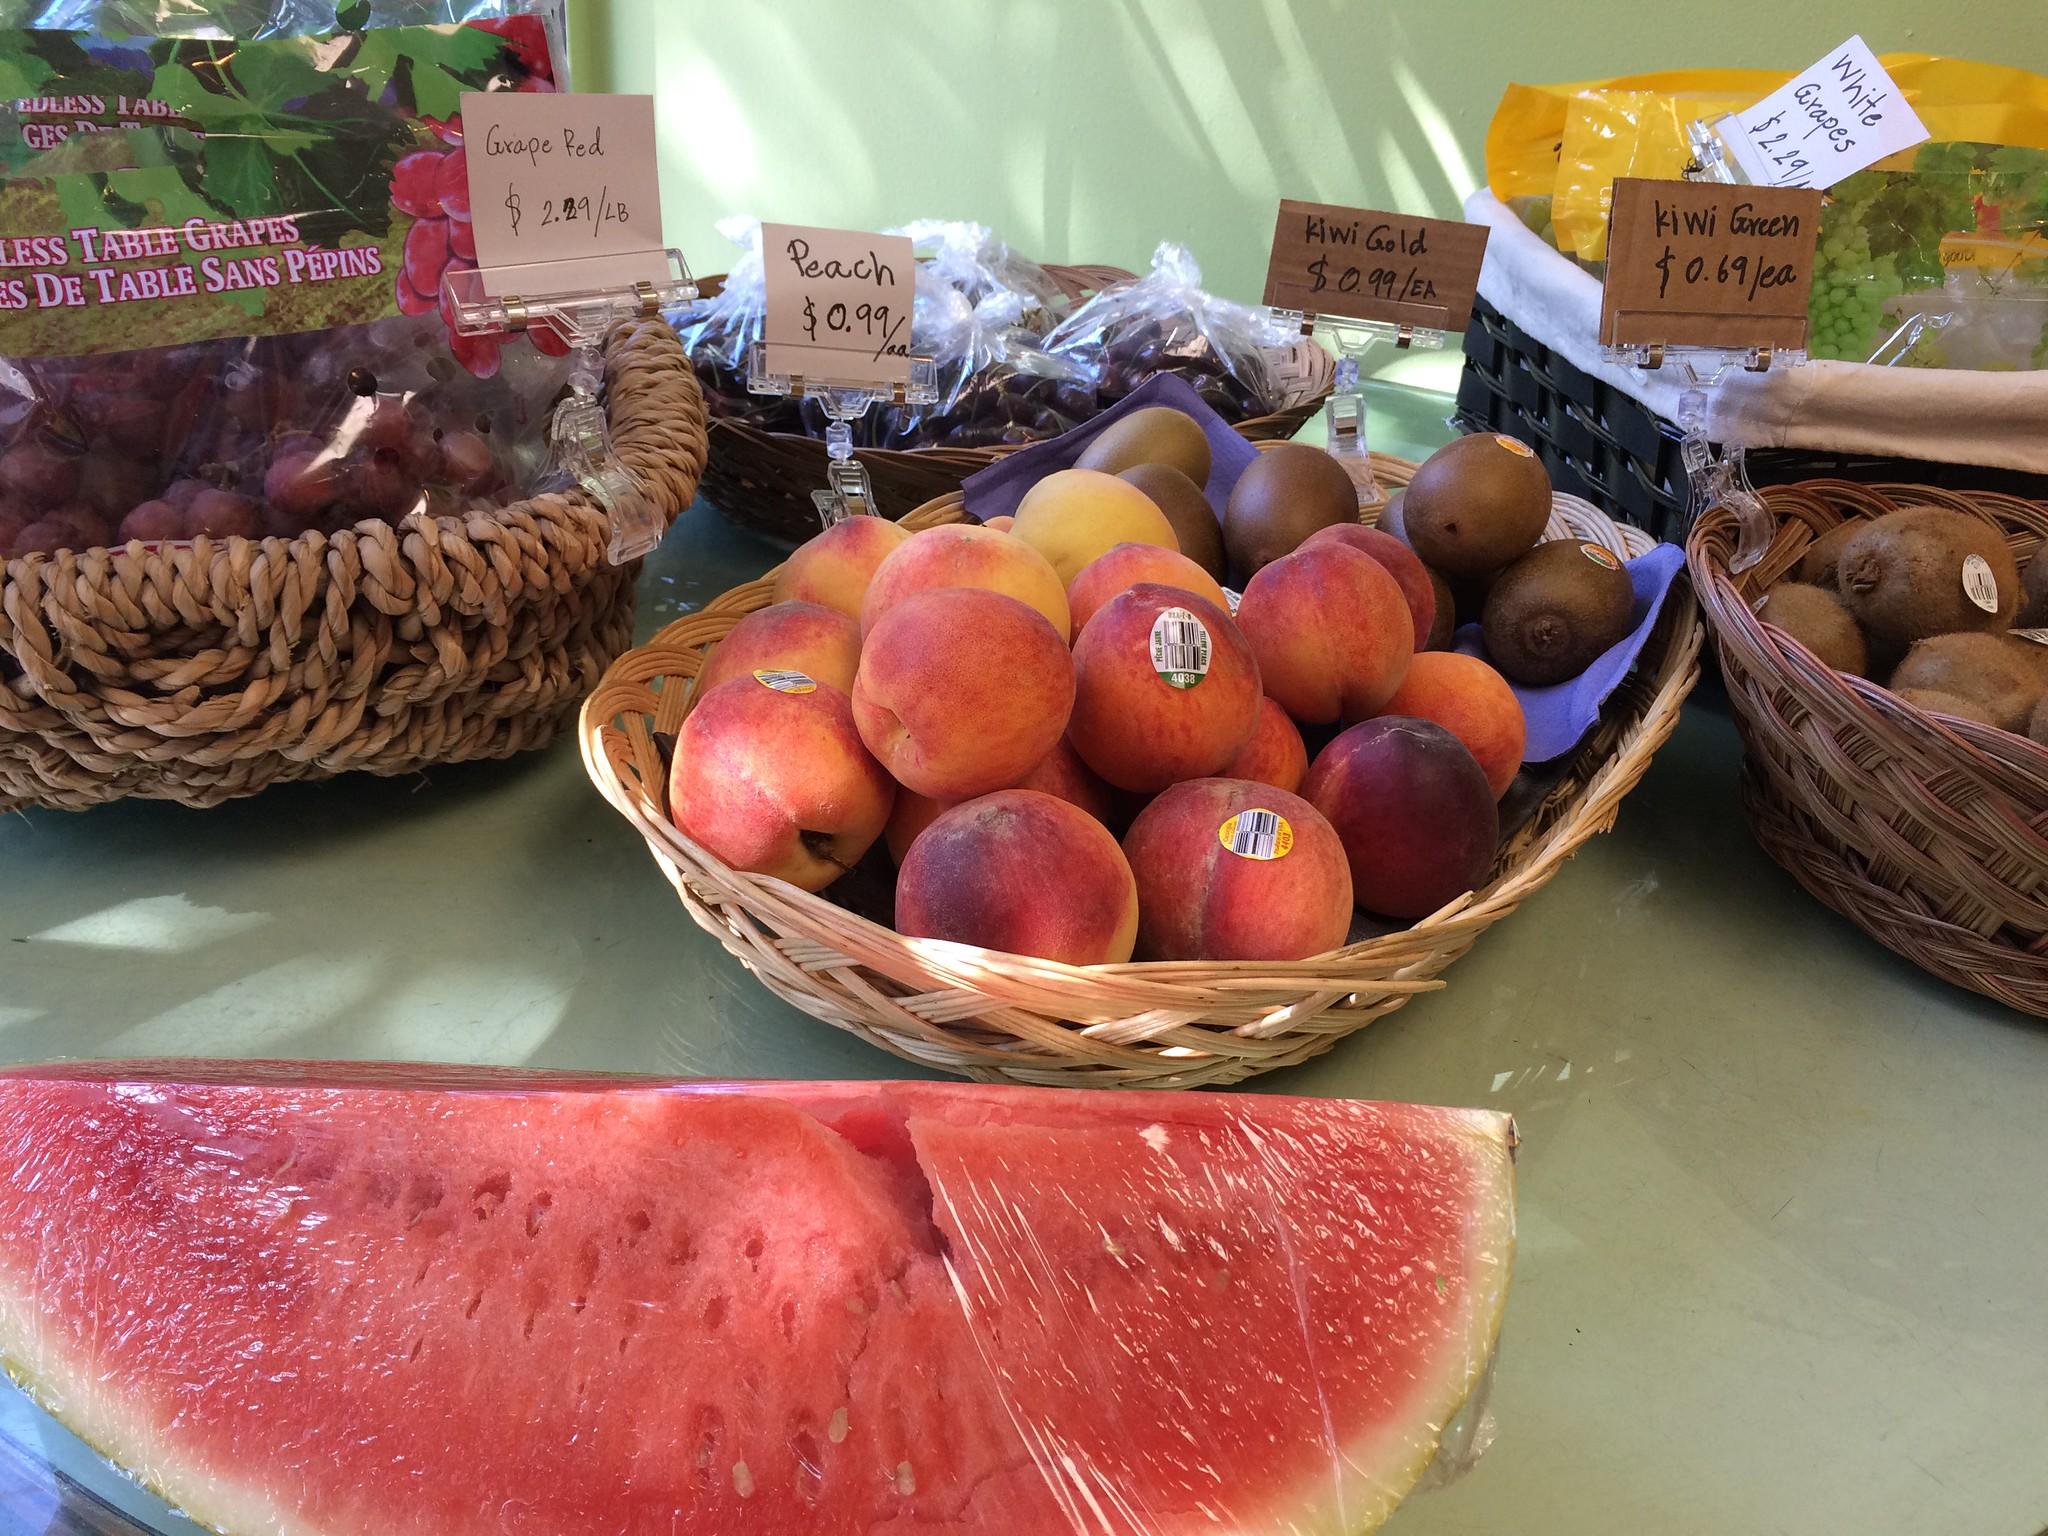 TK's fruit, produce & bubble tea